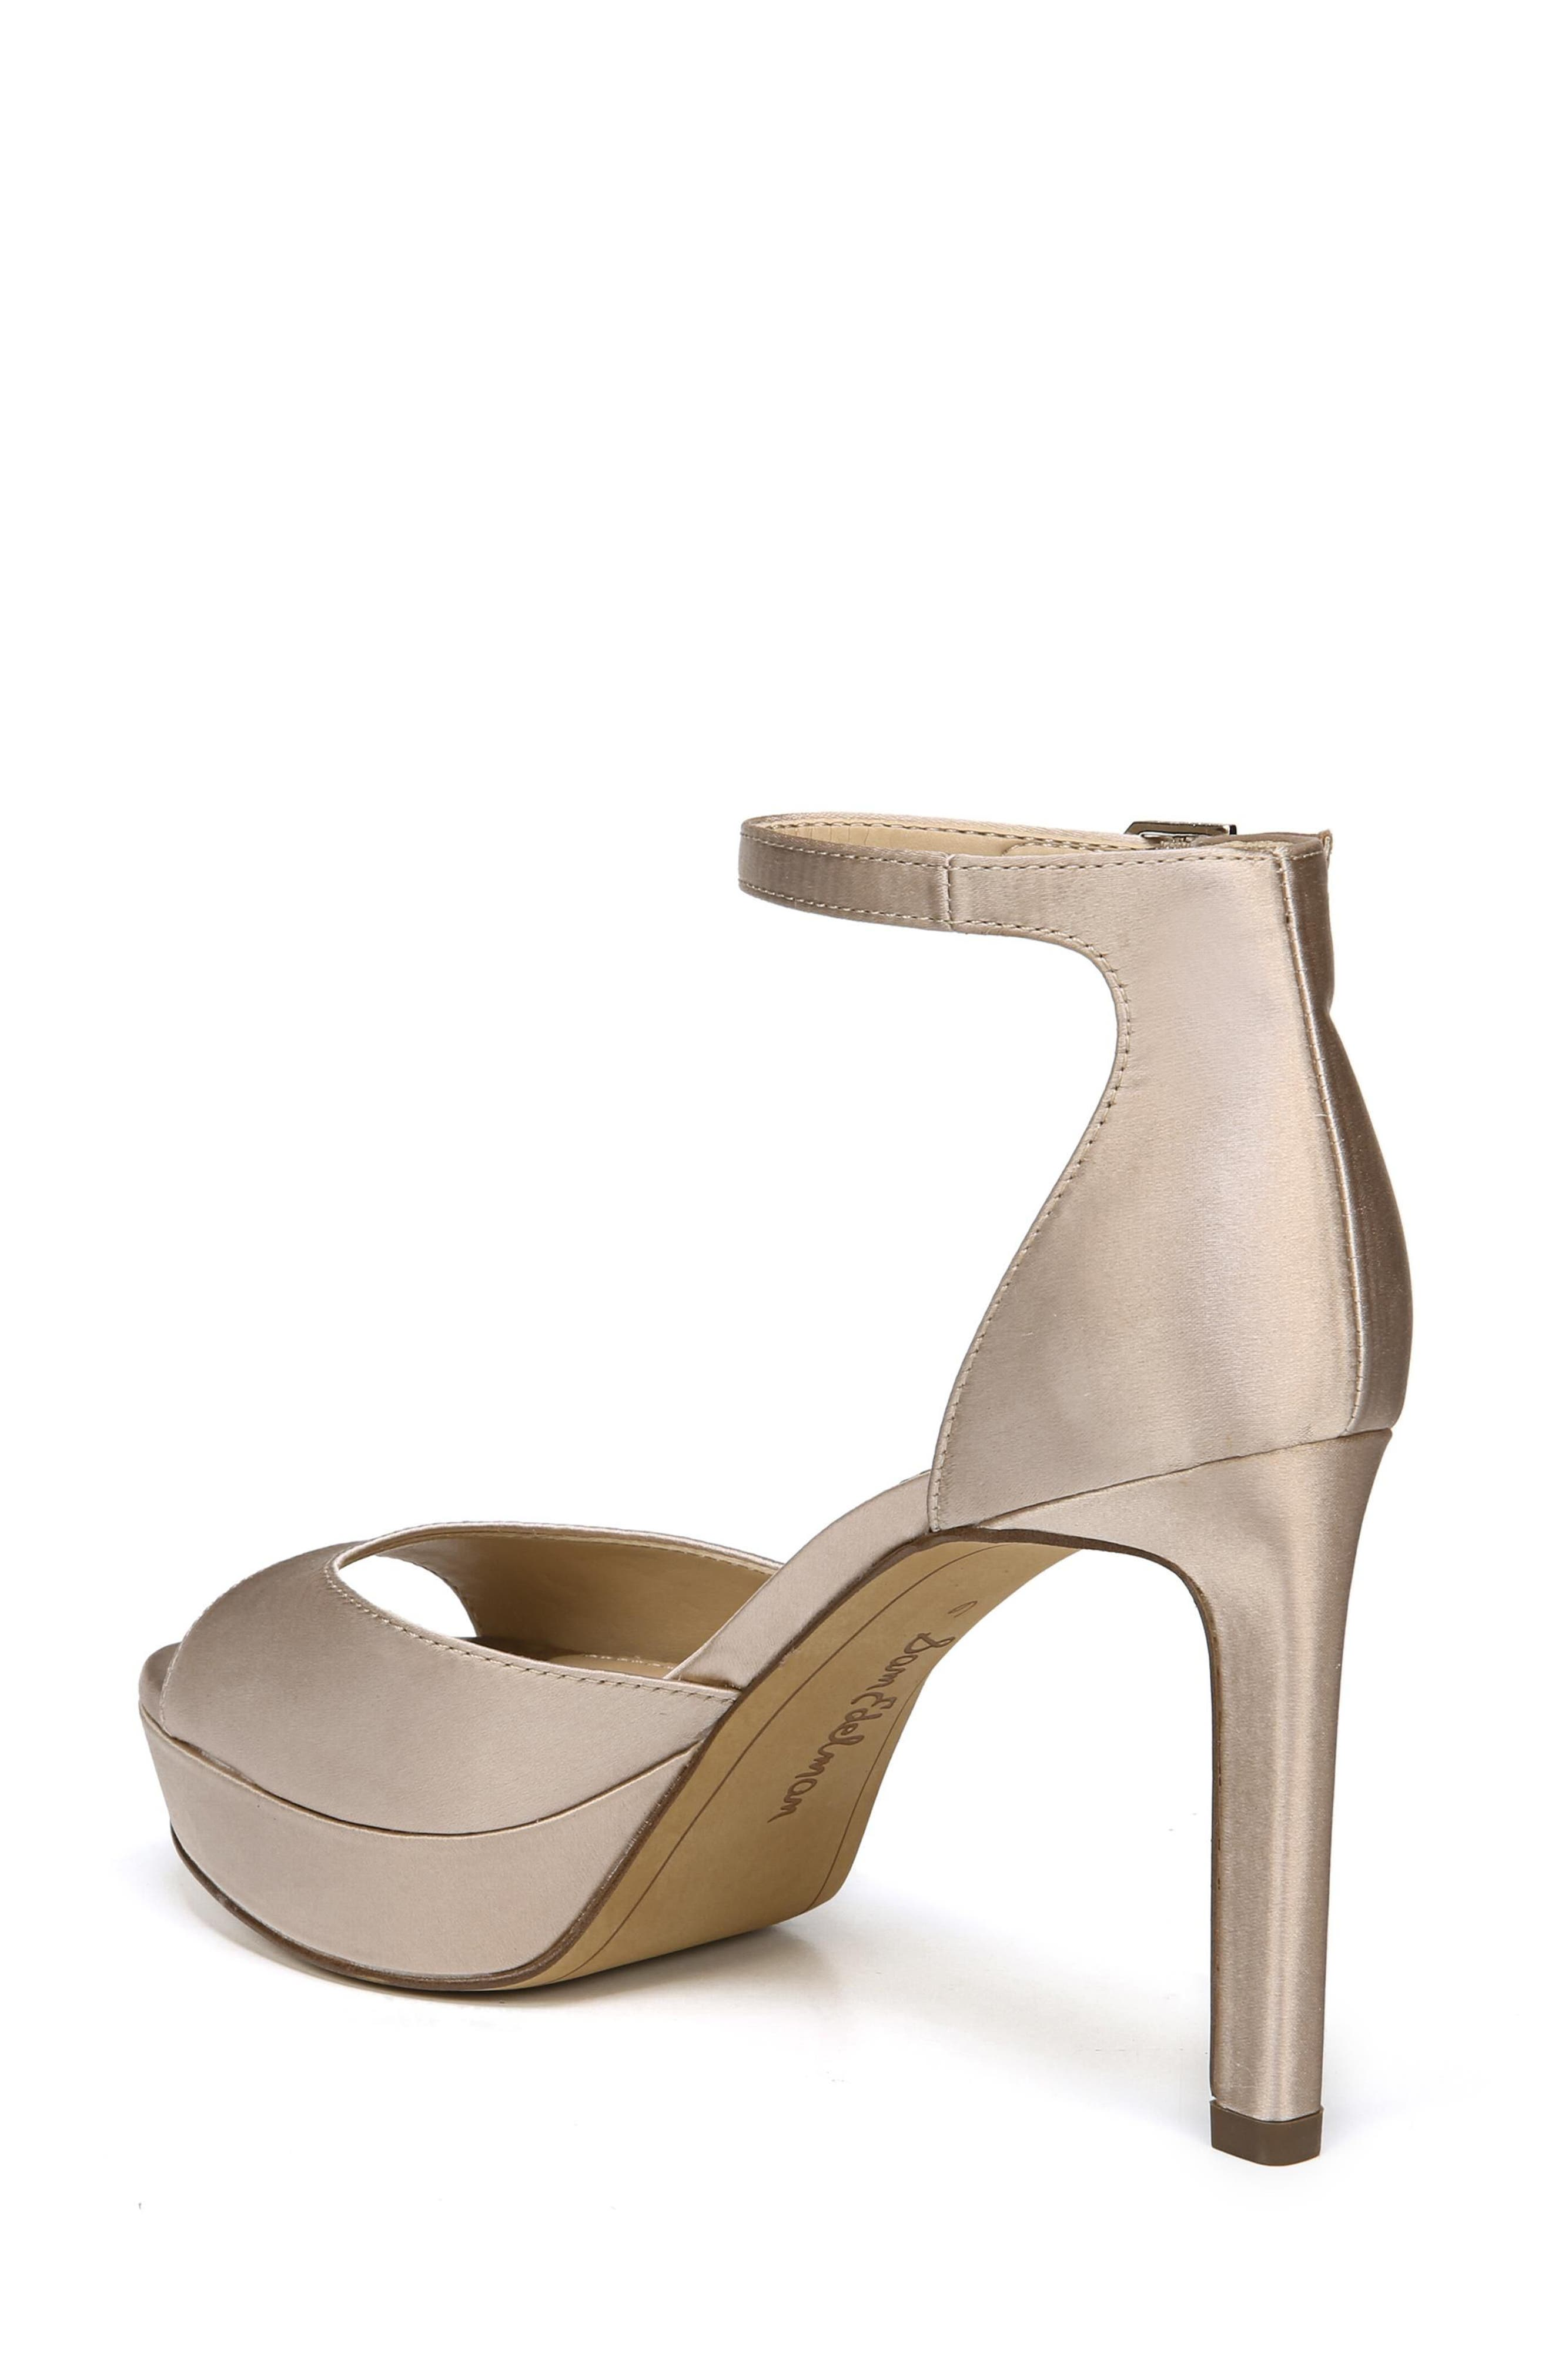 Jerin Platform Sandal,                             Alternate thumbnail 4, color,